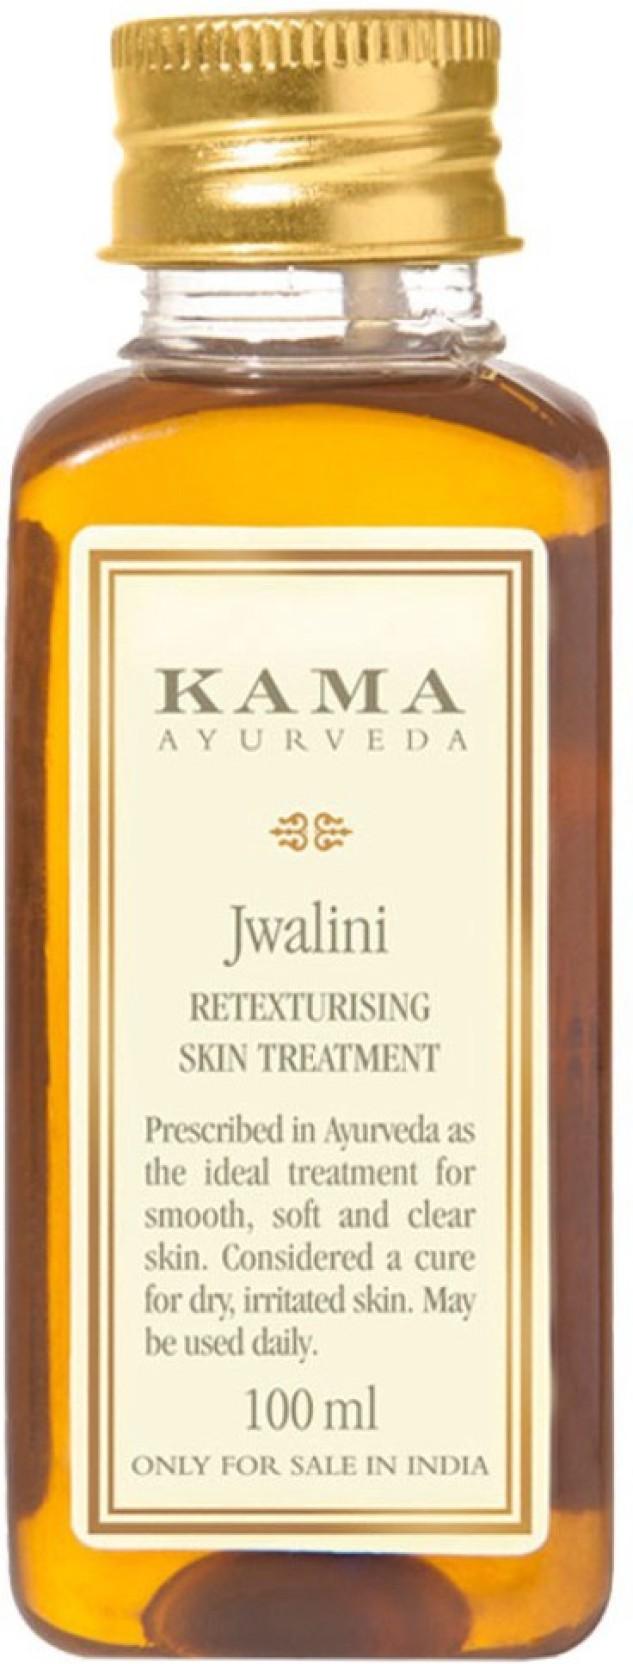 Kama Ayurveda Jwalini Retexturising Skin Treatment Oil, 100ml Suki Purifying Foaming Cleanser - 100ml